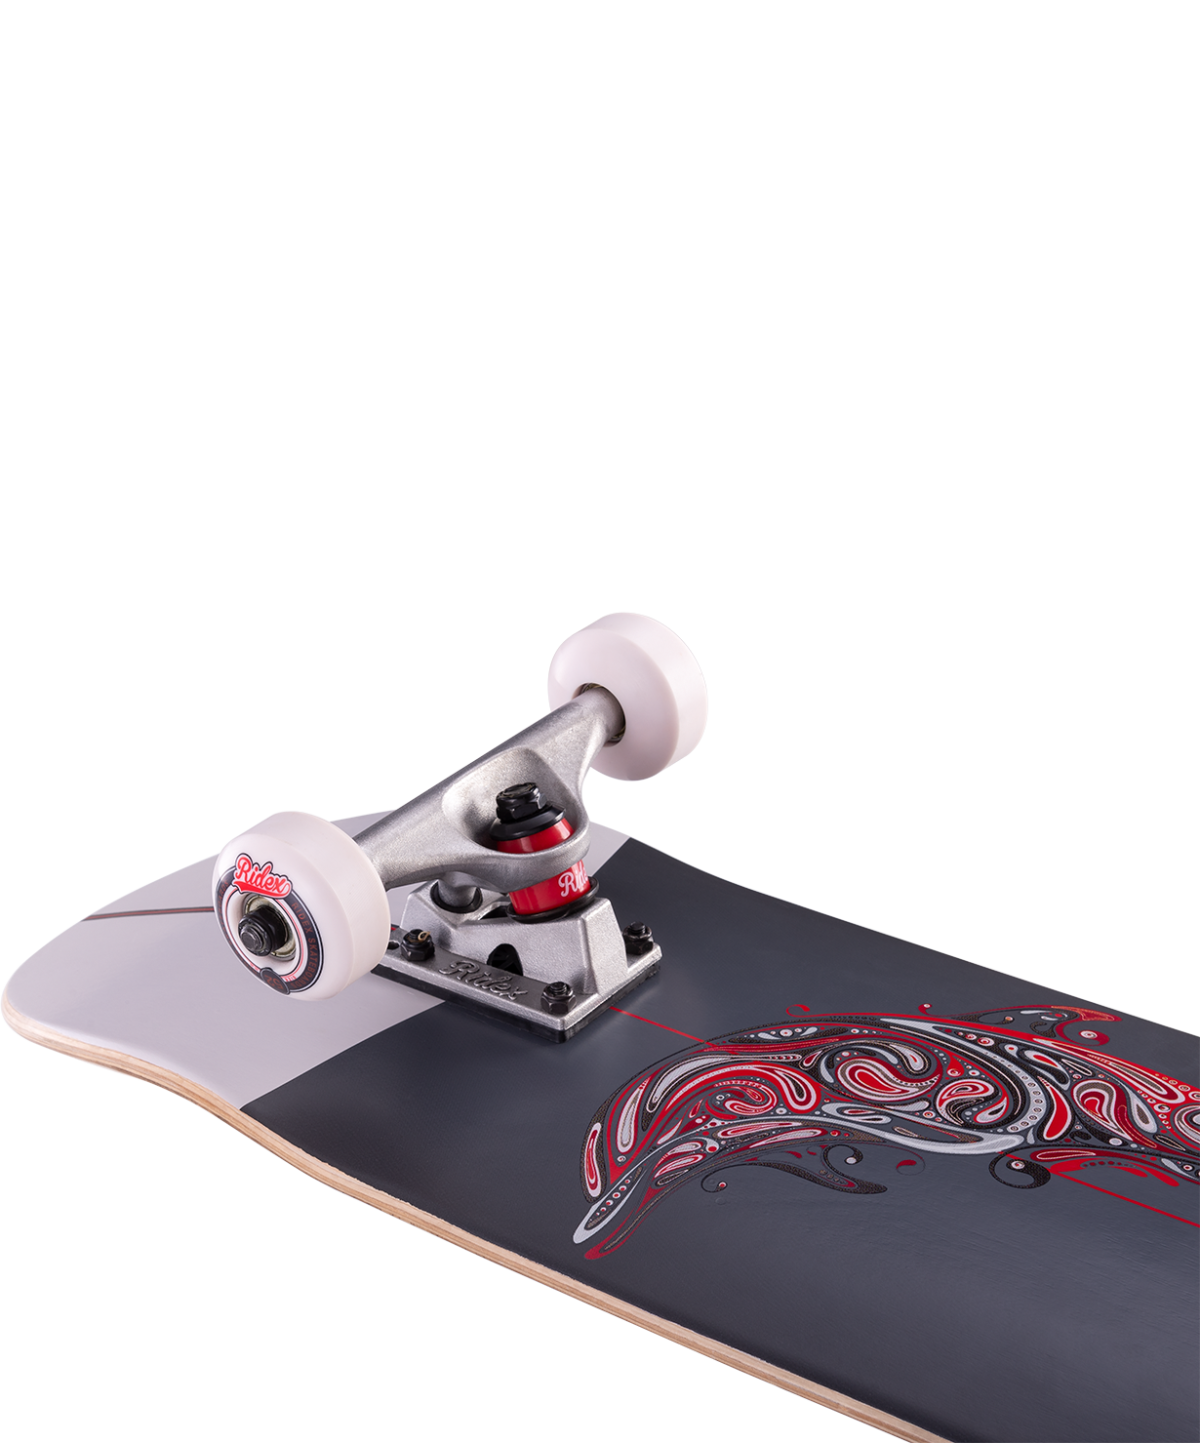 RIDEX скейтборд Blacksea - 4